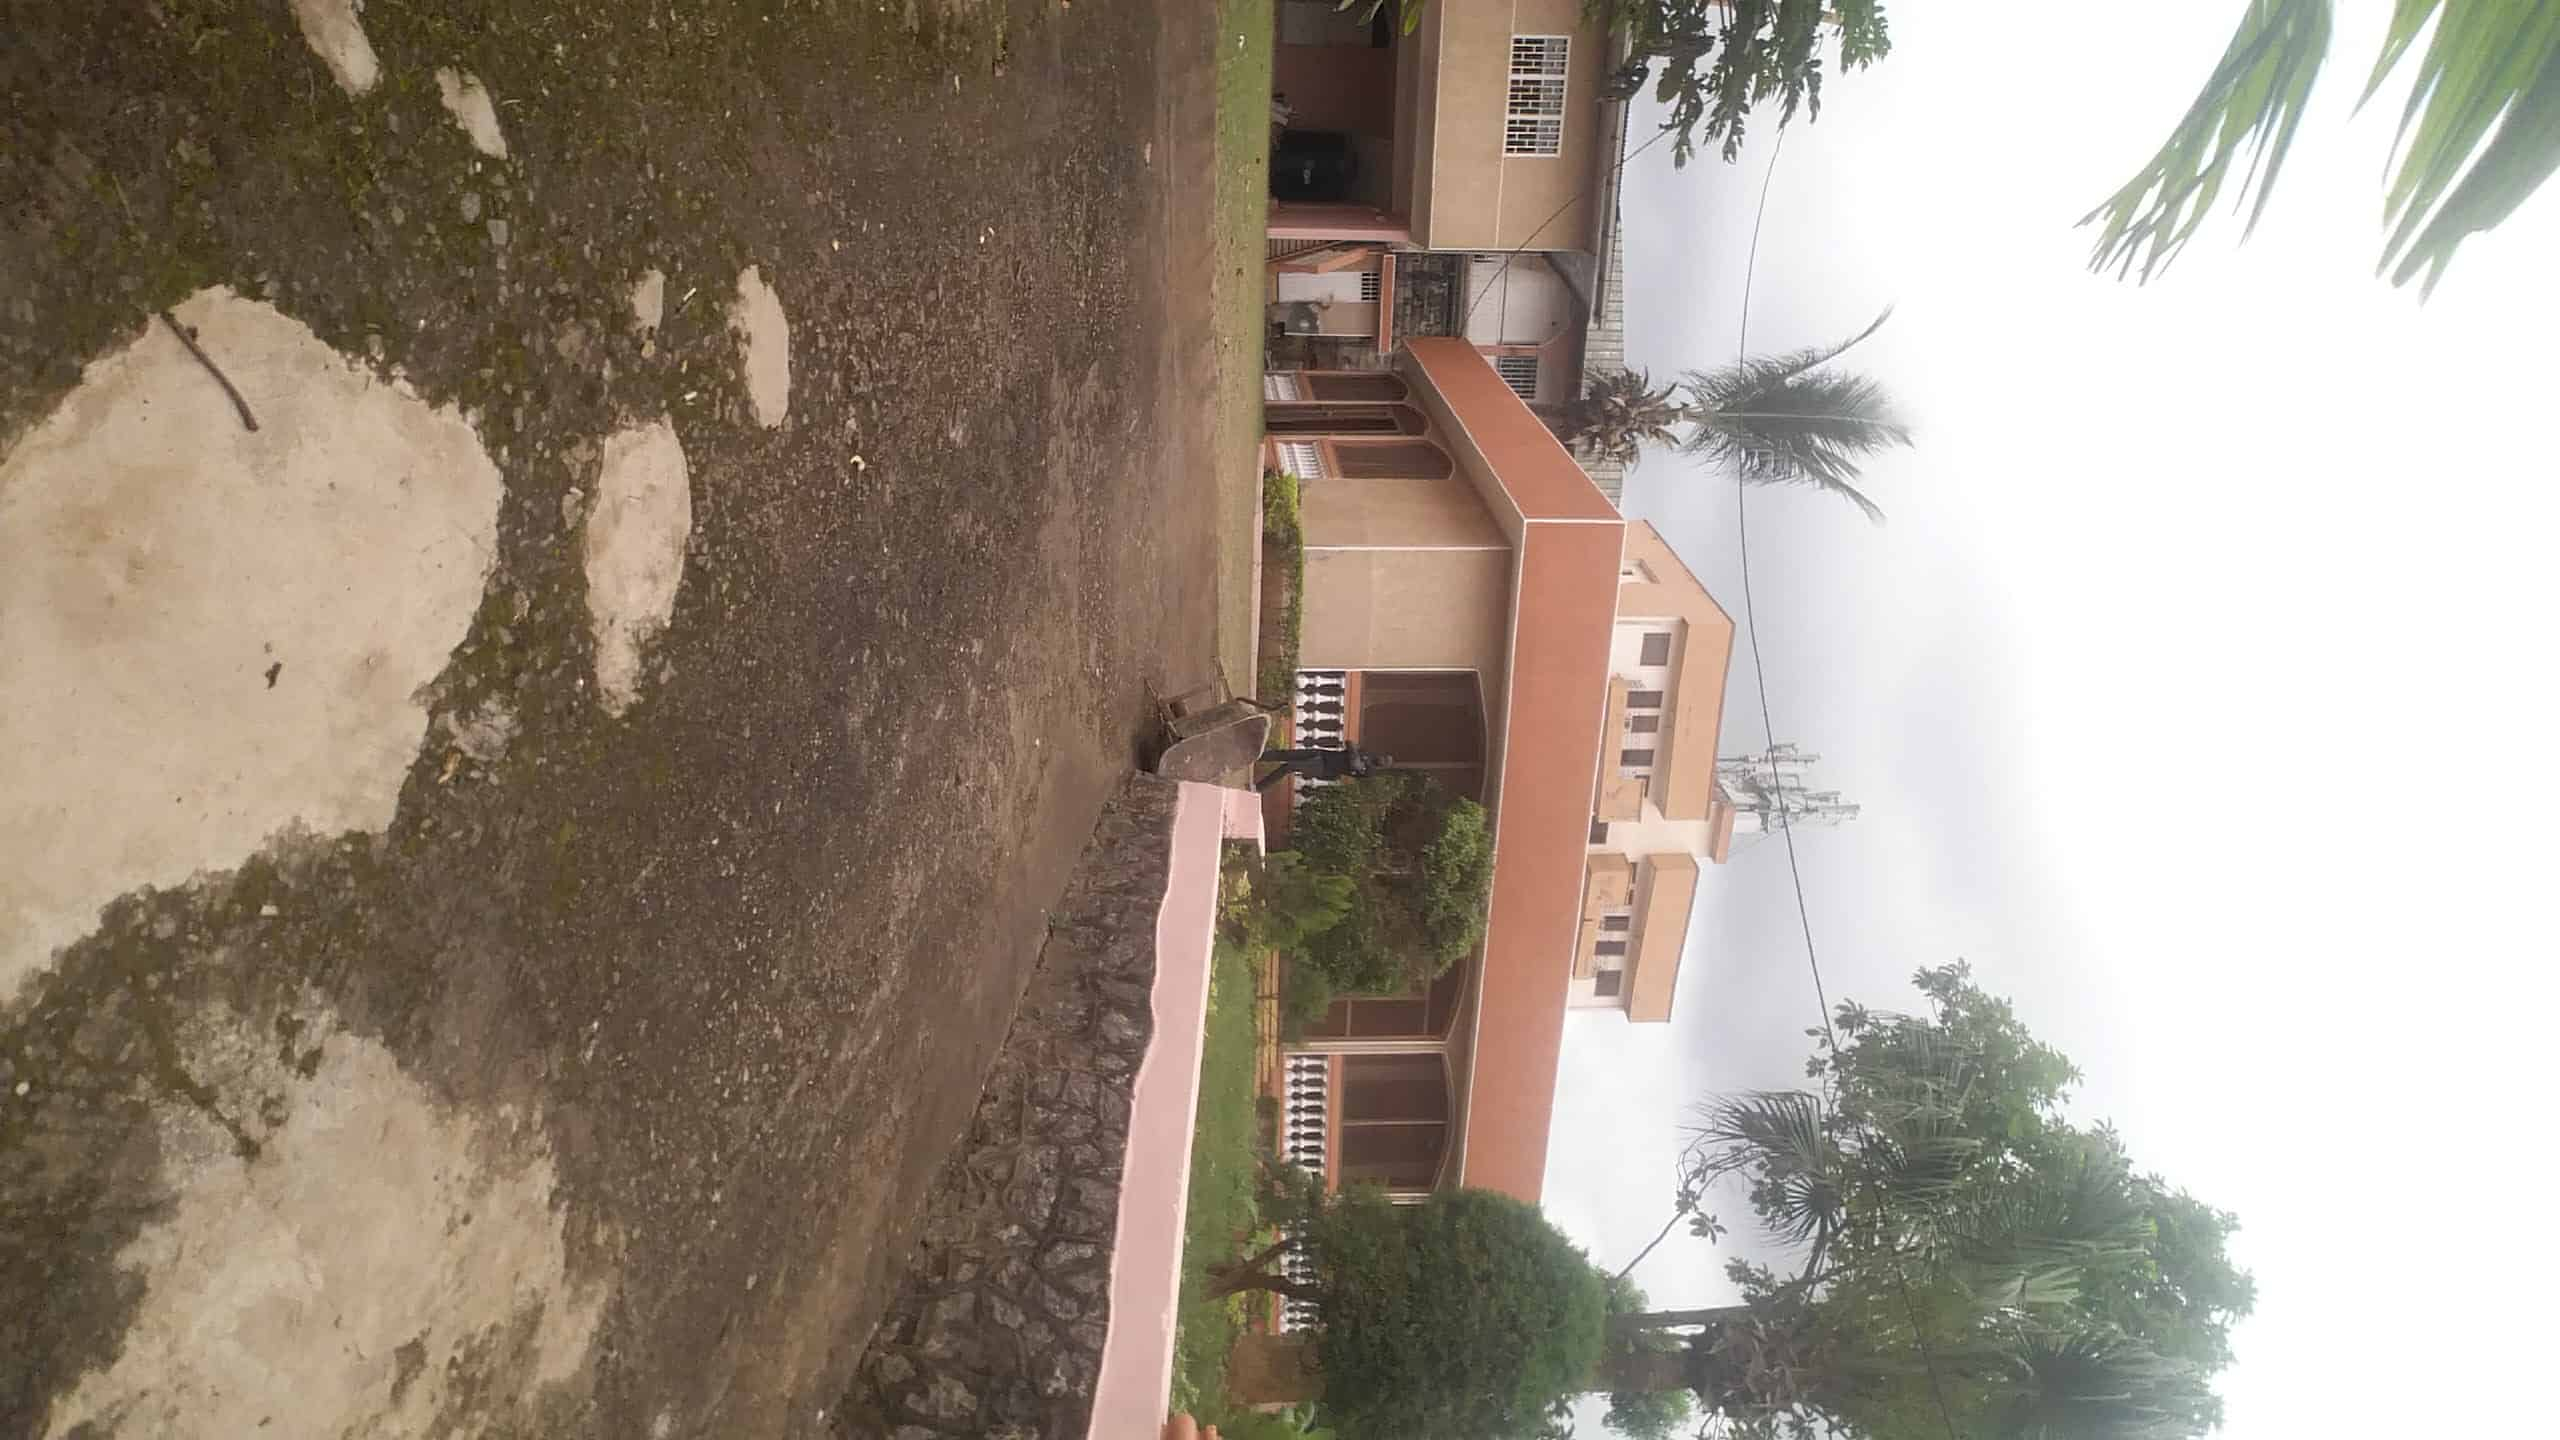 House (Villa) to rent - Yaoundé, Mfandena, Nouvelle route omnisport - 3 living room(s), 4 bedroom(s), 3 bathroom(s) - 900 000 FCFA / month